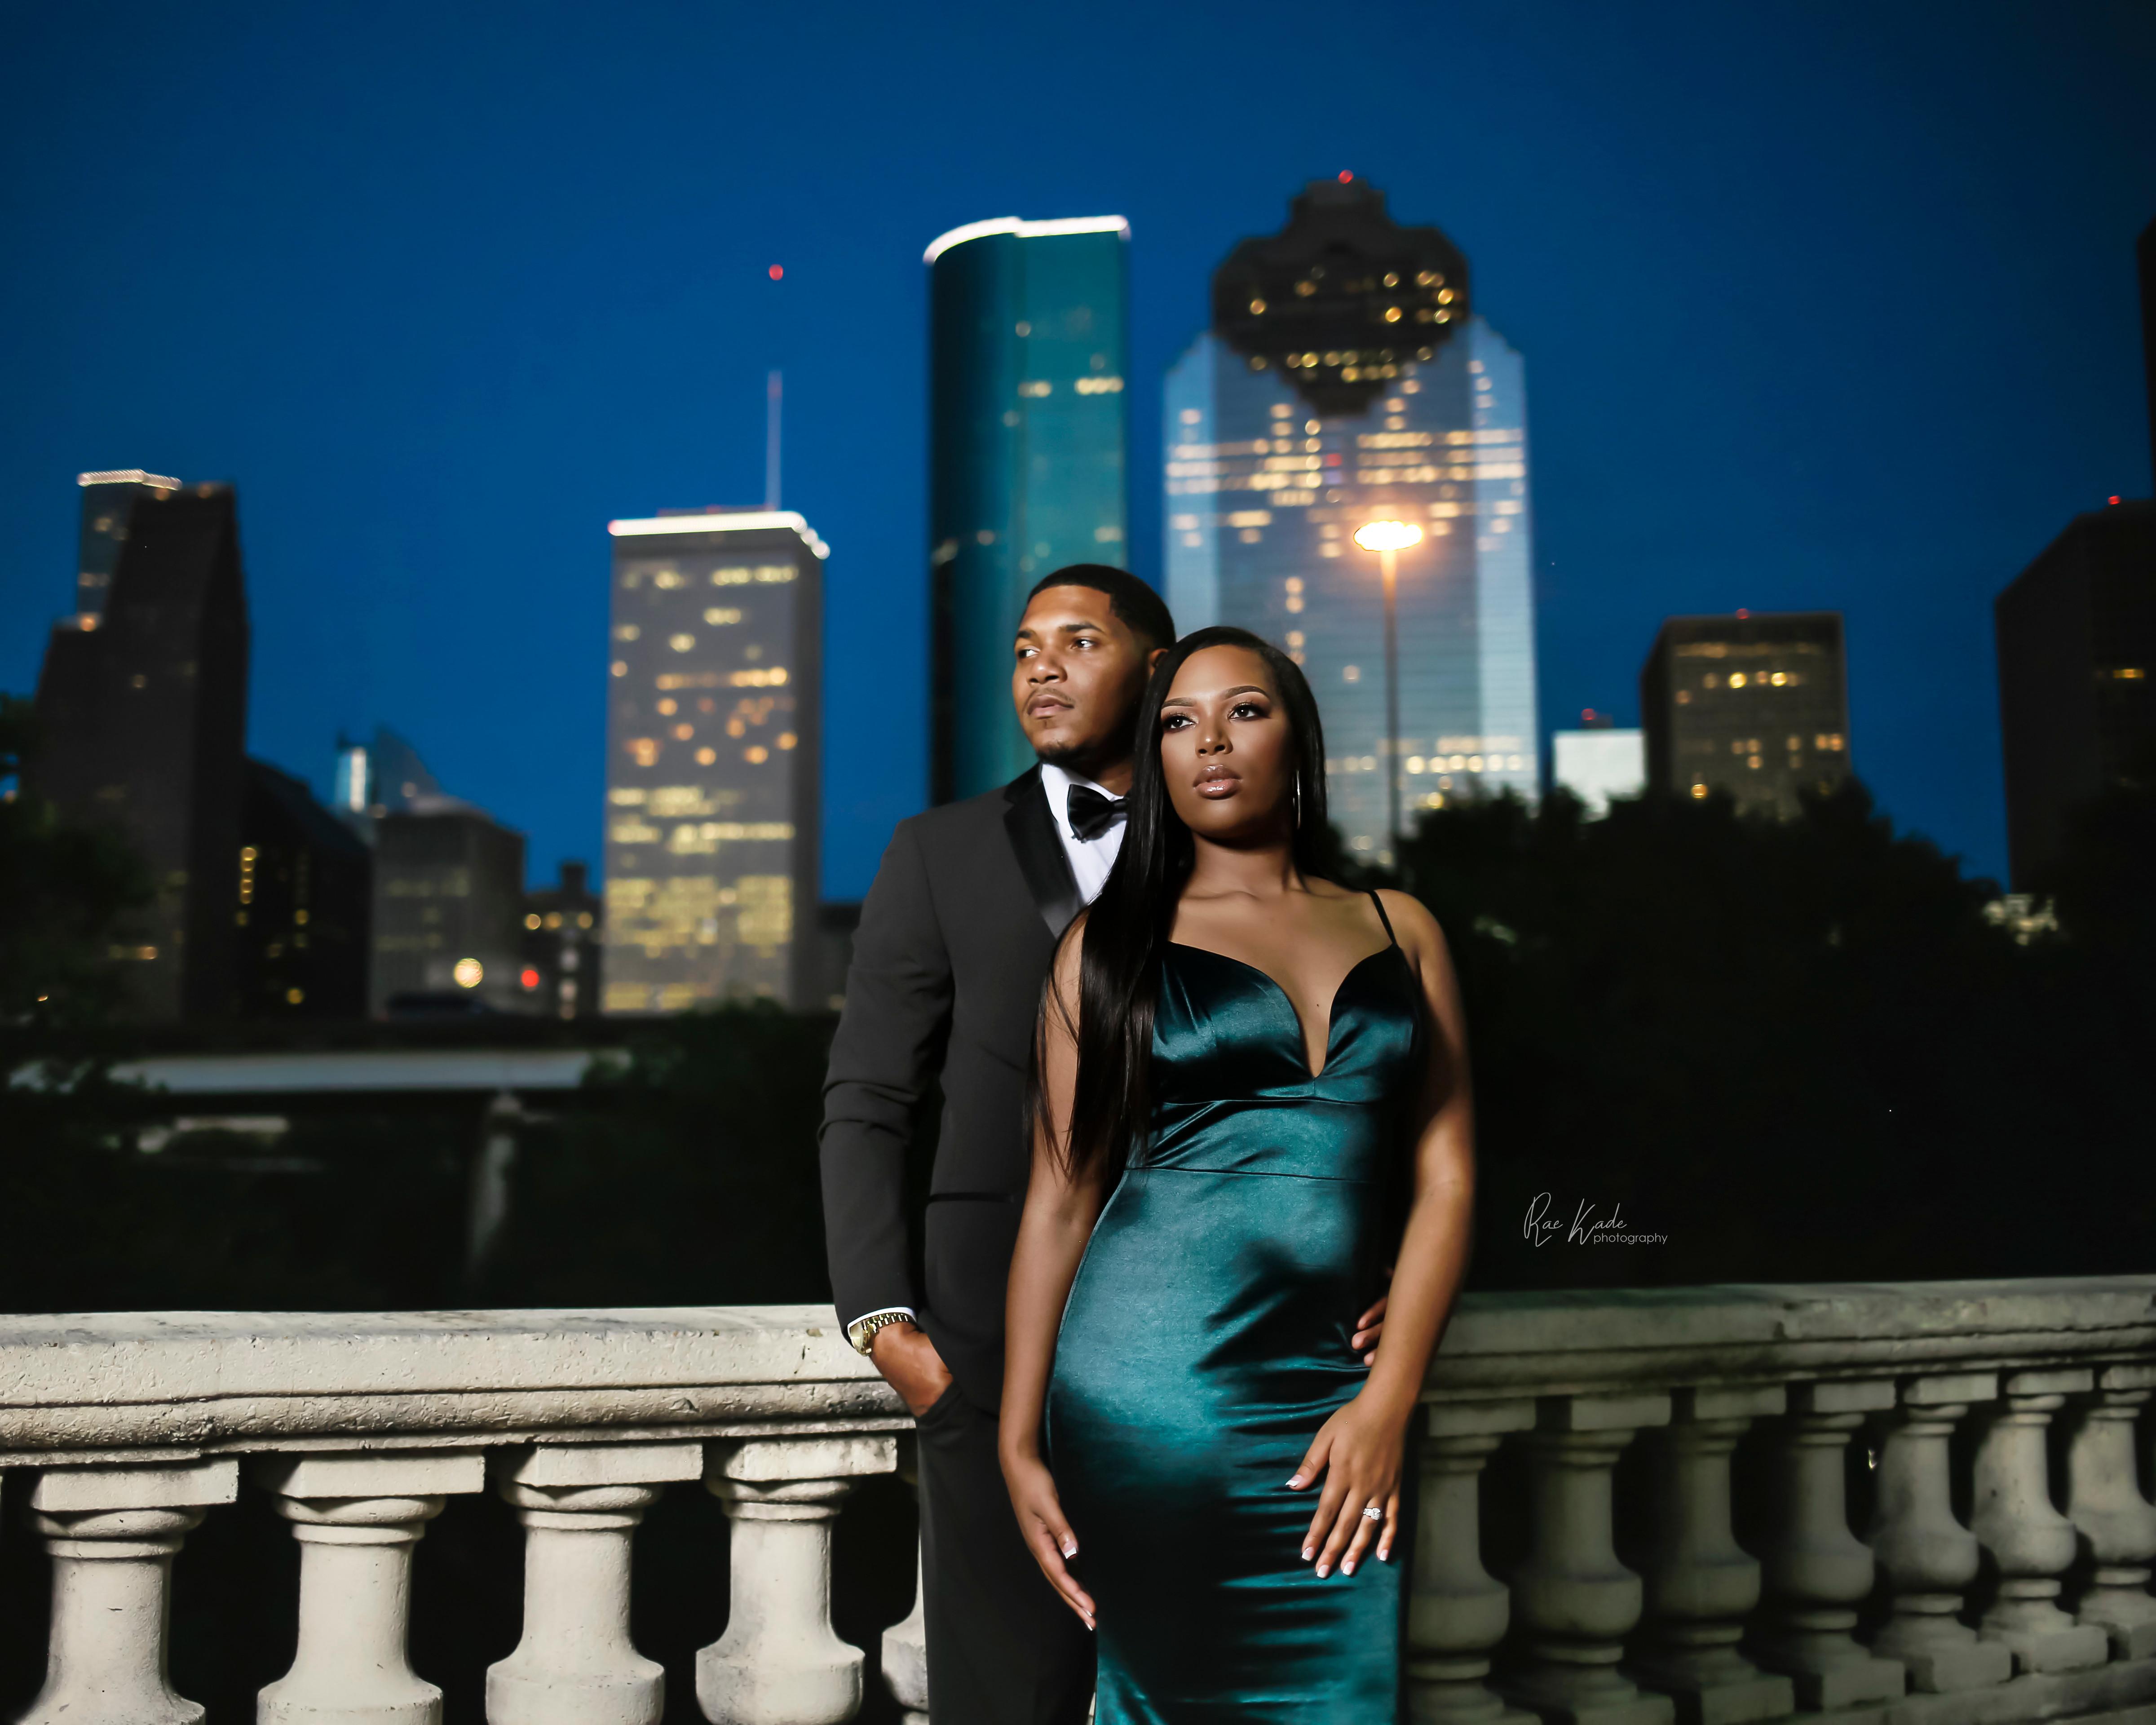 ***Engagement/Bridal Photography